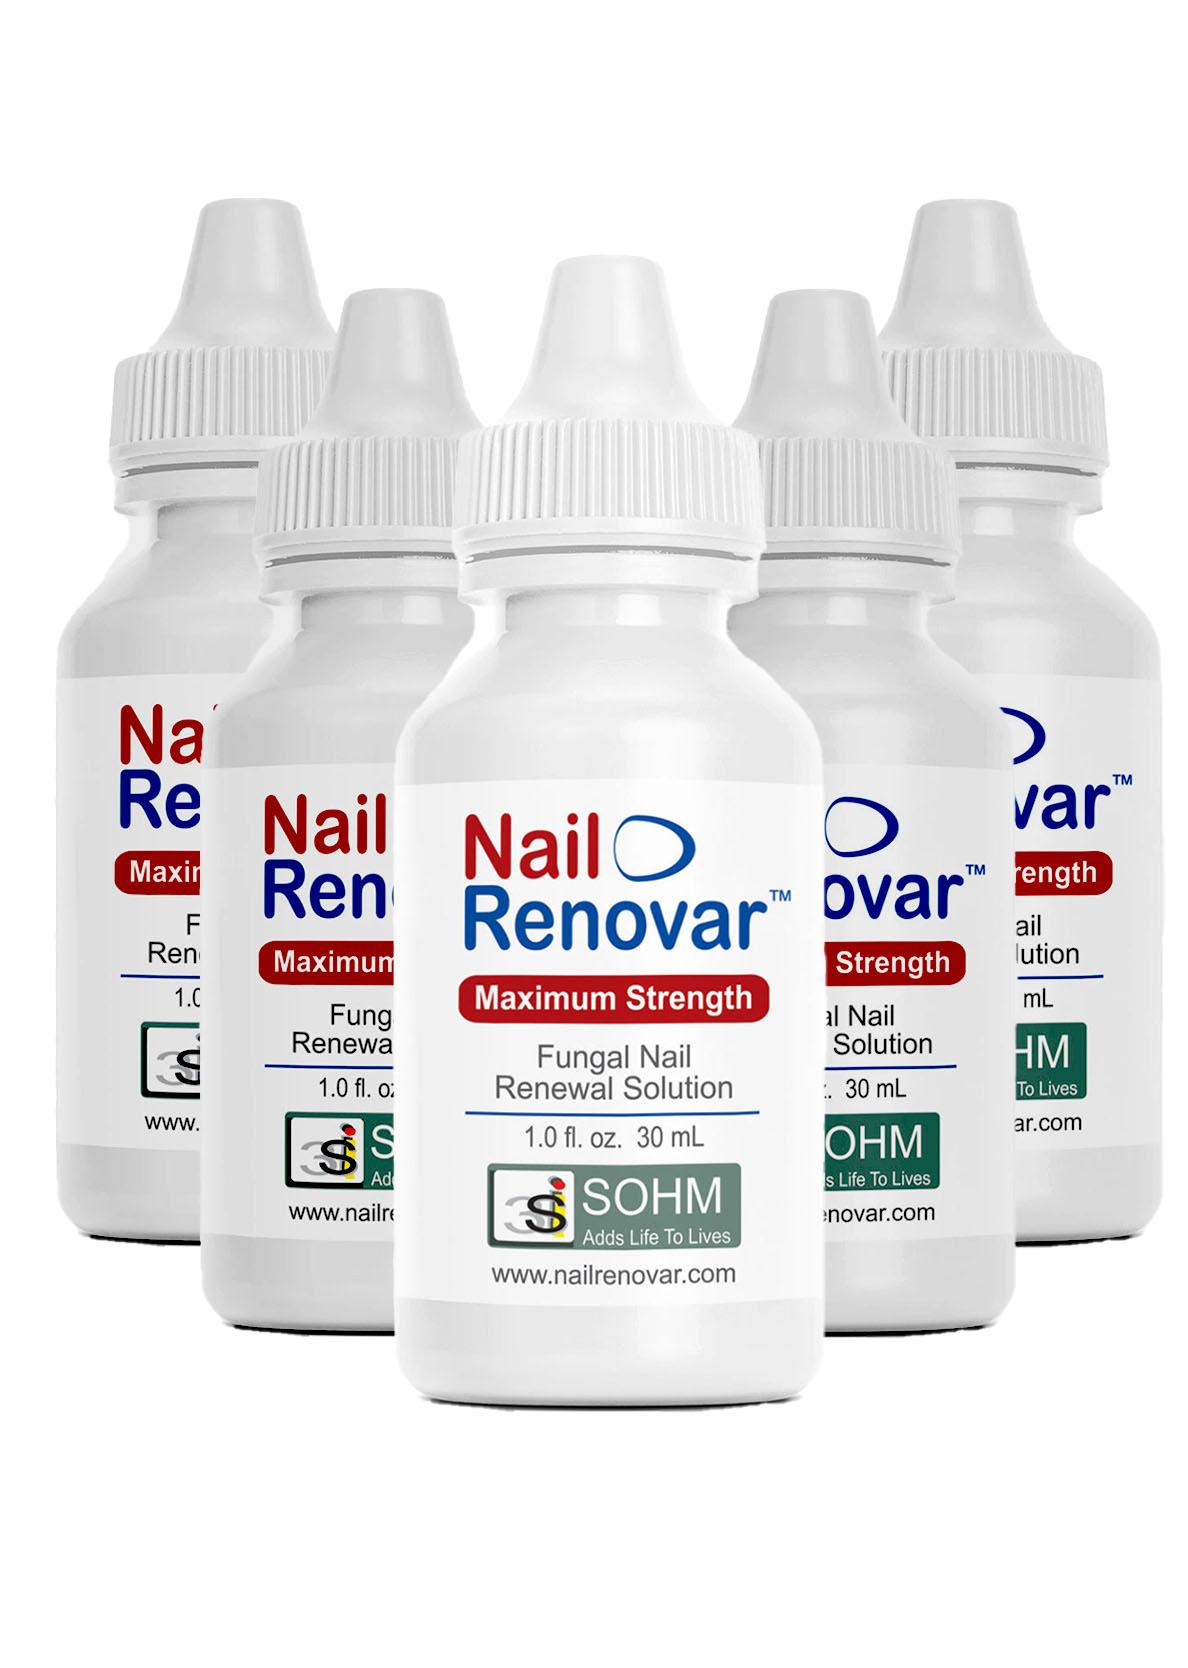 Nail Renovar Five Pack